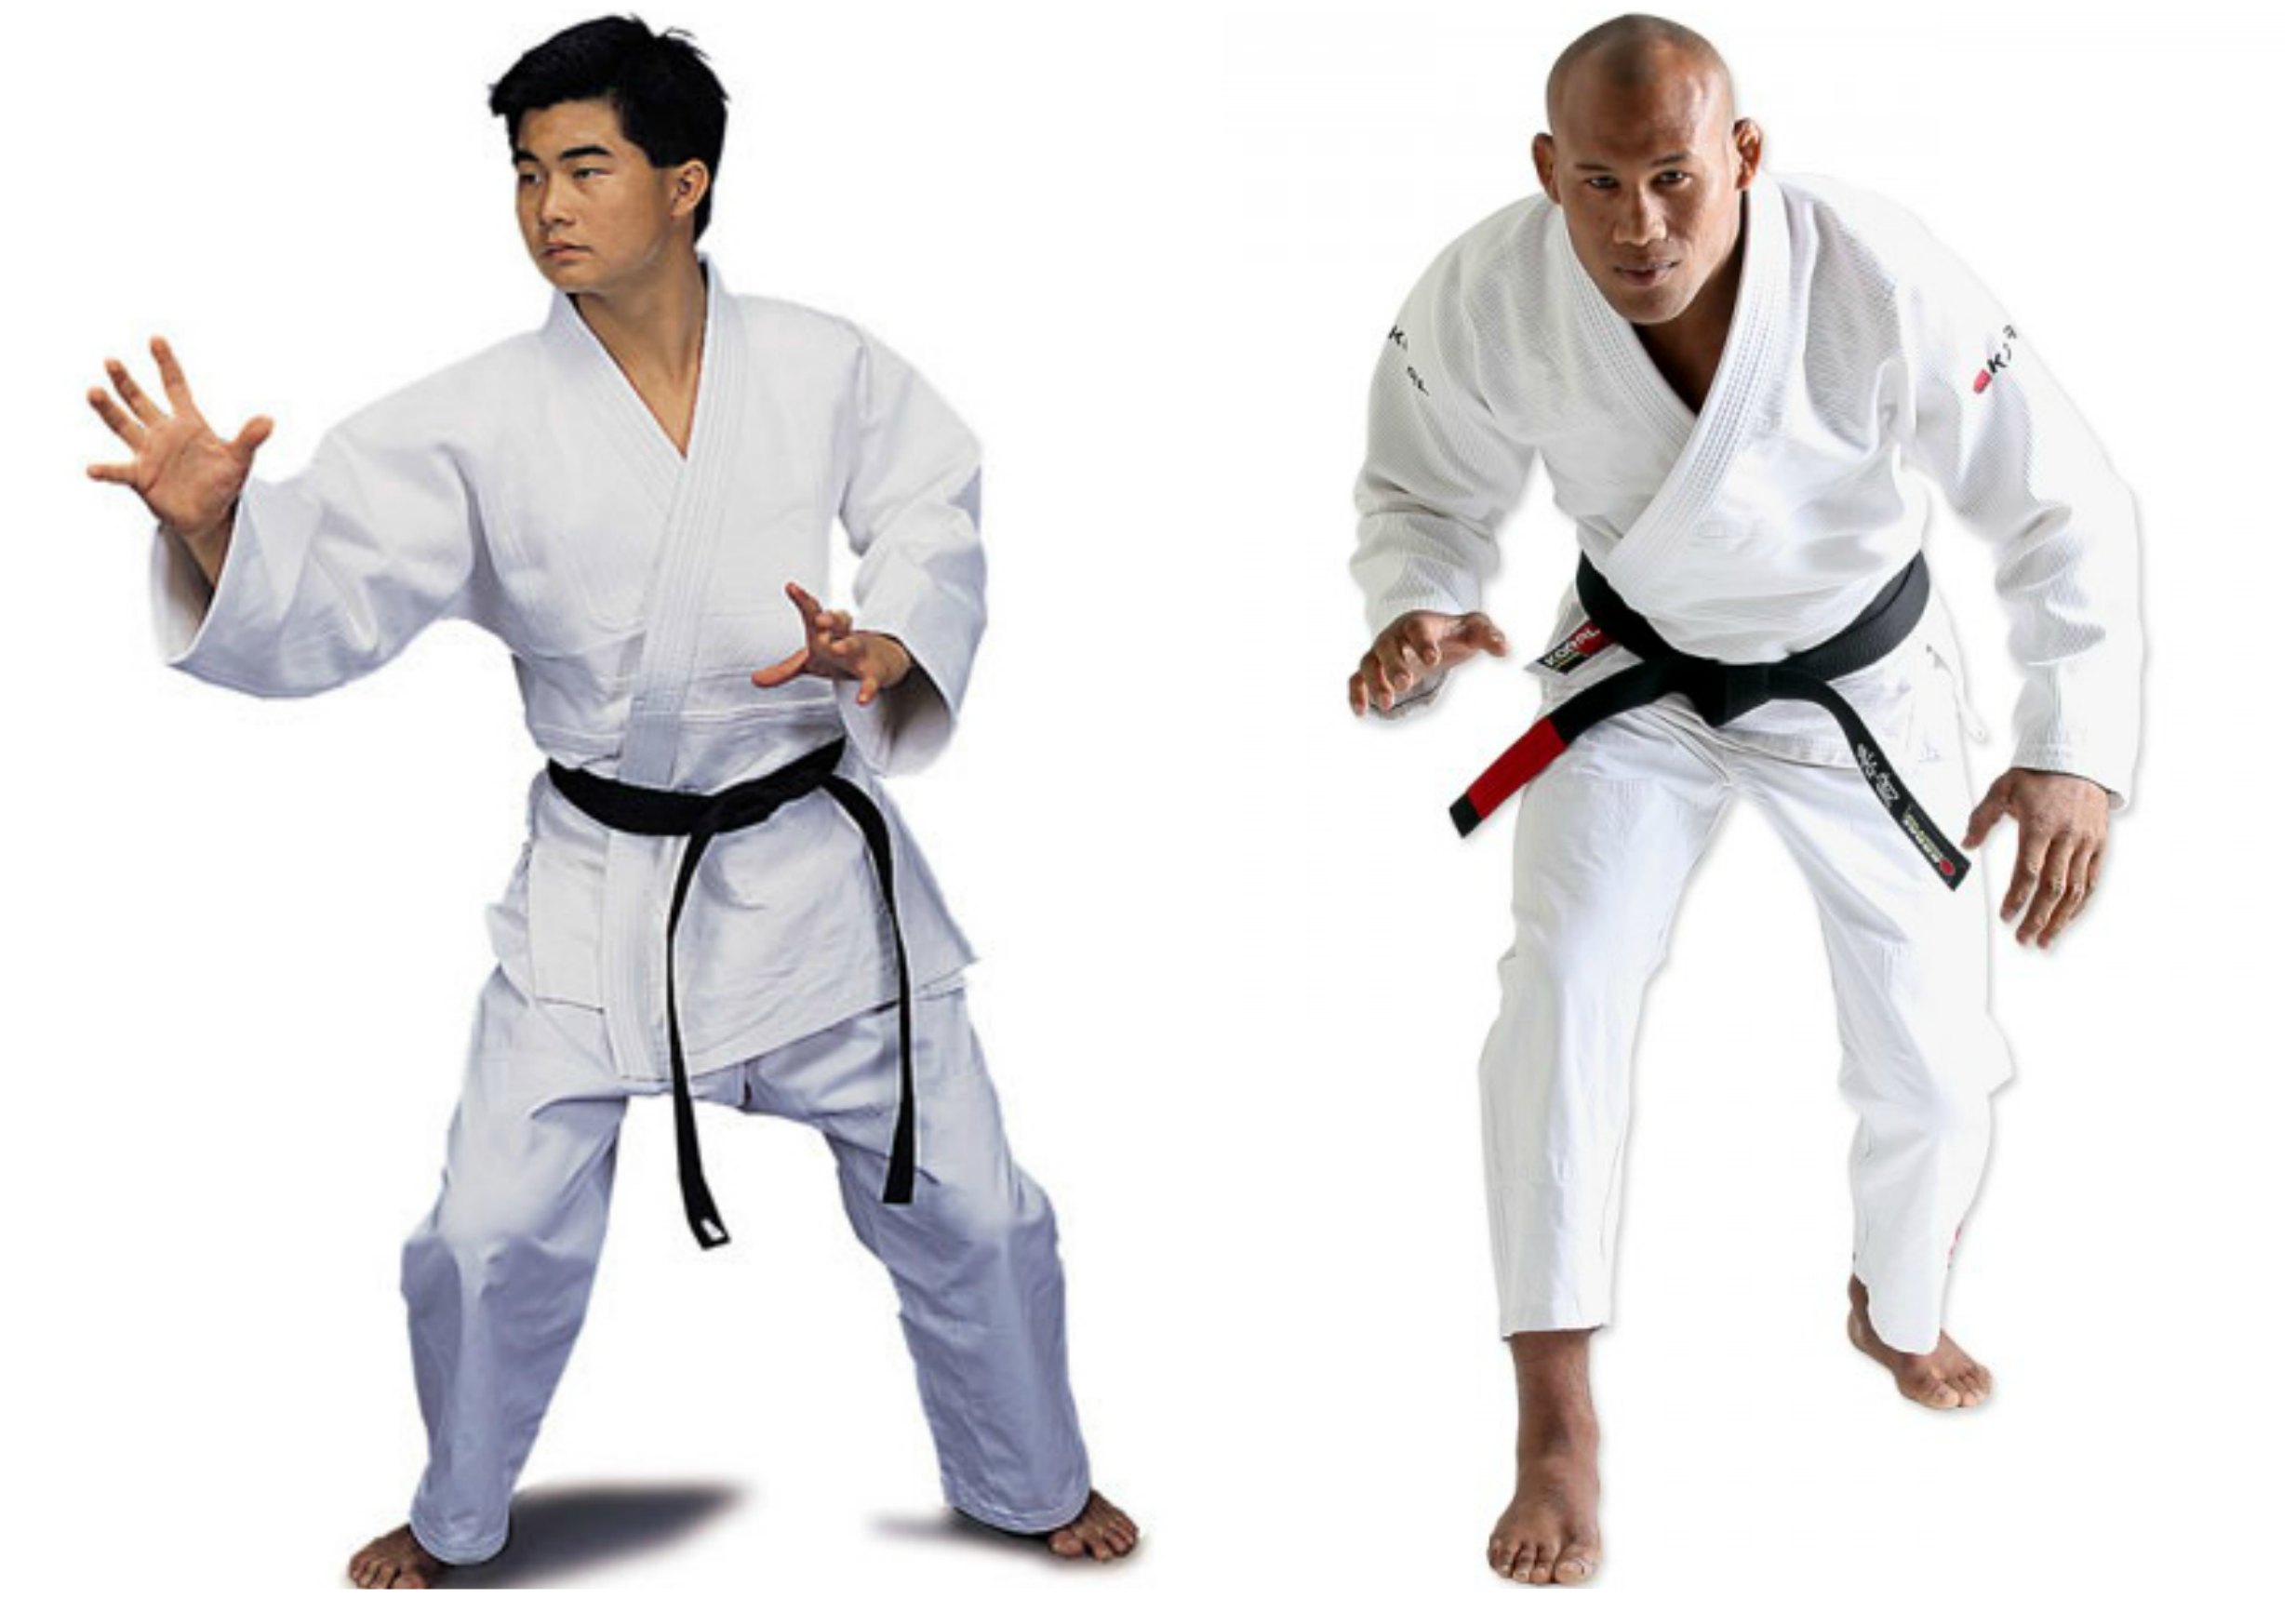 comparing brazilian jujitsu and kickboxing essay